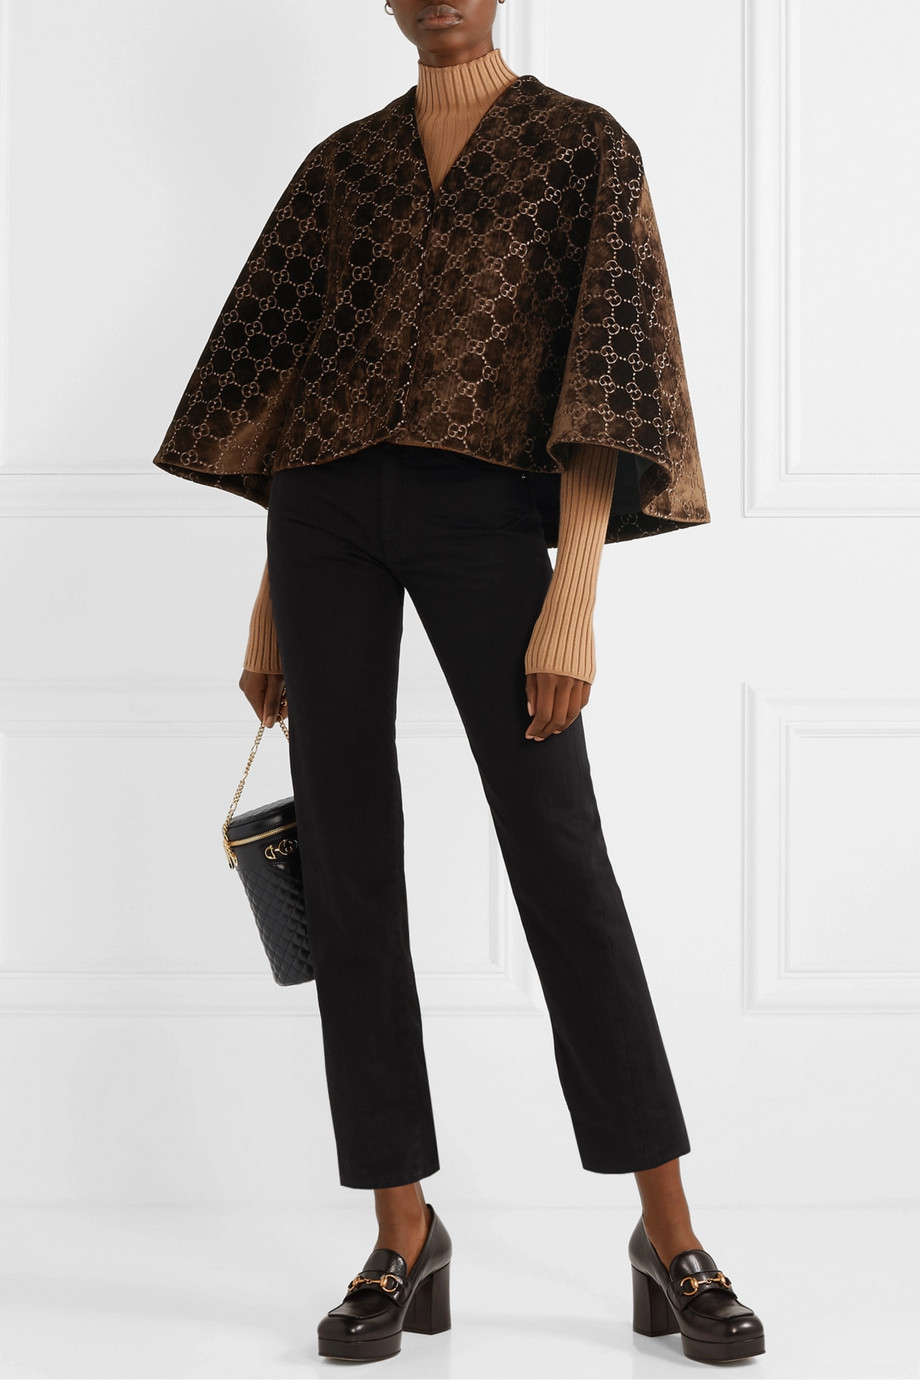 Gucci Cape aus Samt mit Jacquard-Muster